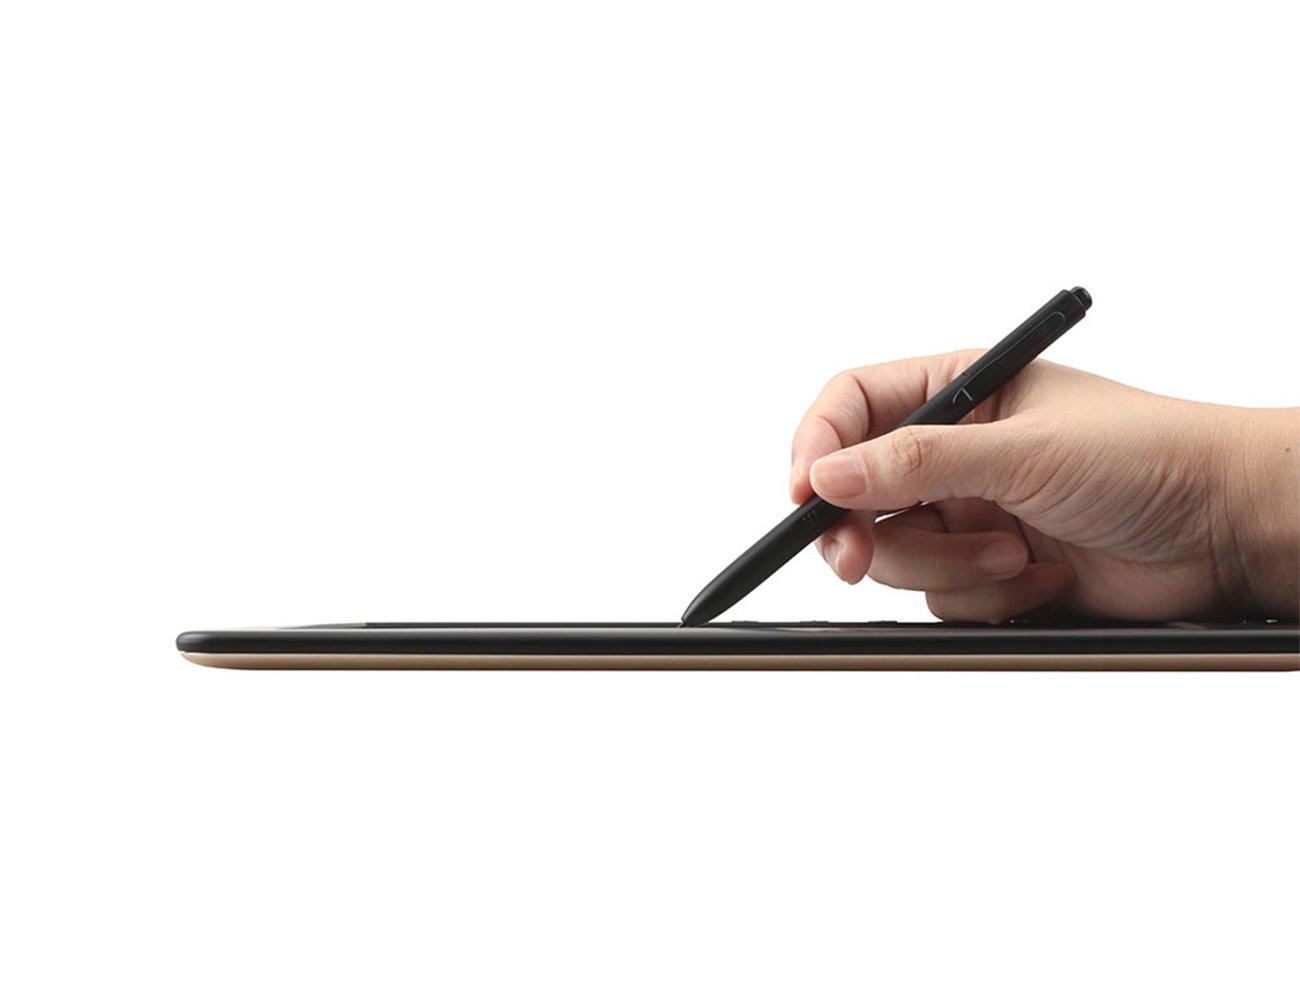 BOOX Hanvon Lápiz para MAX Carta N96 N96ML, Pantalla Táctil Precisión Stylus Repuesto Pluma Onyx International Inc. Stylus Pen